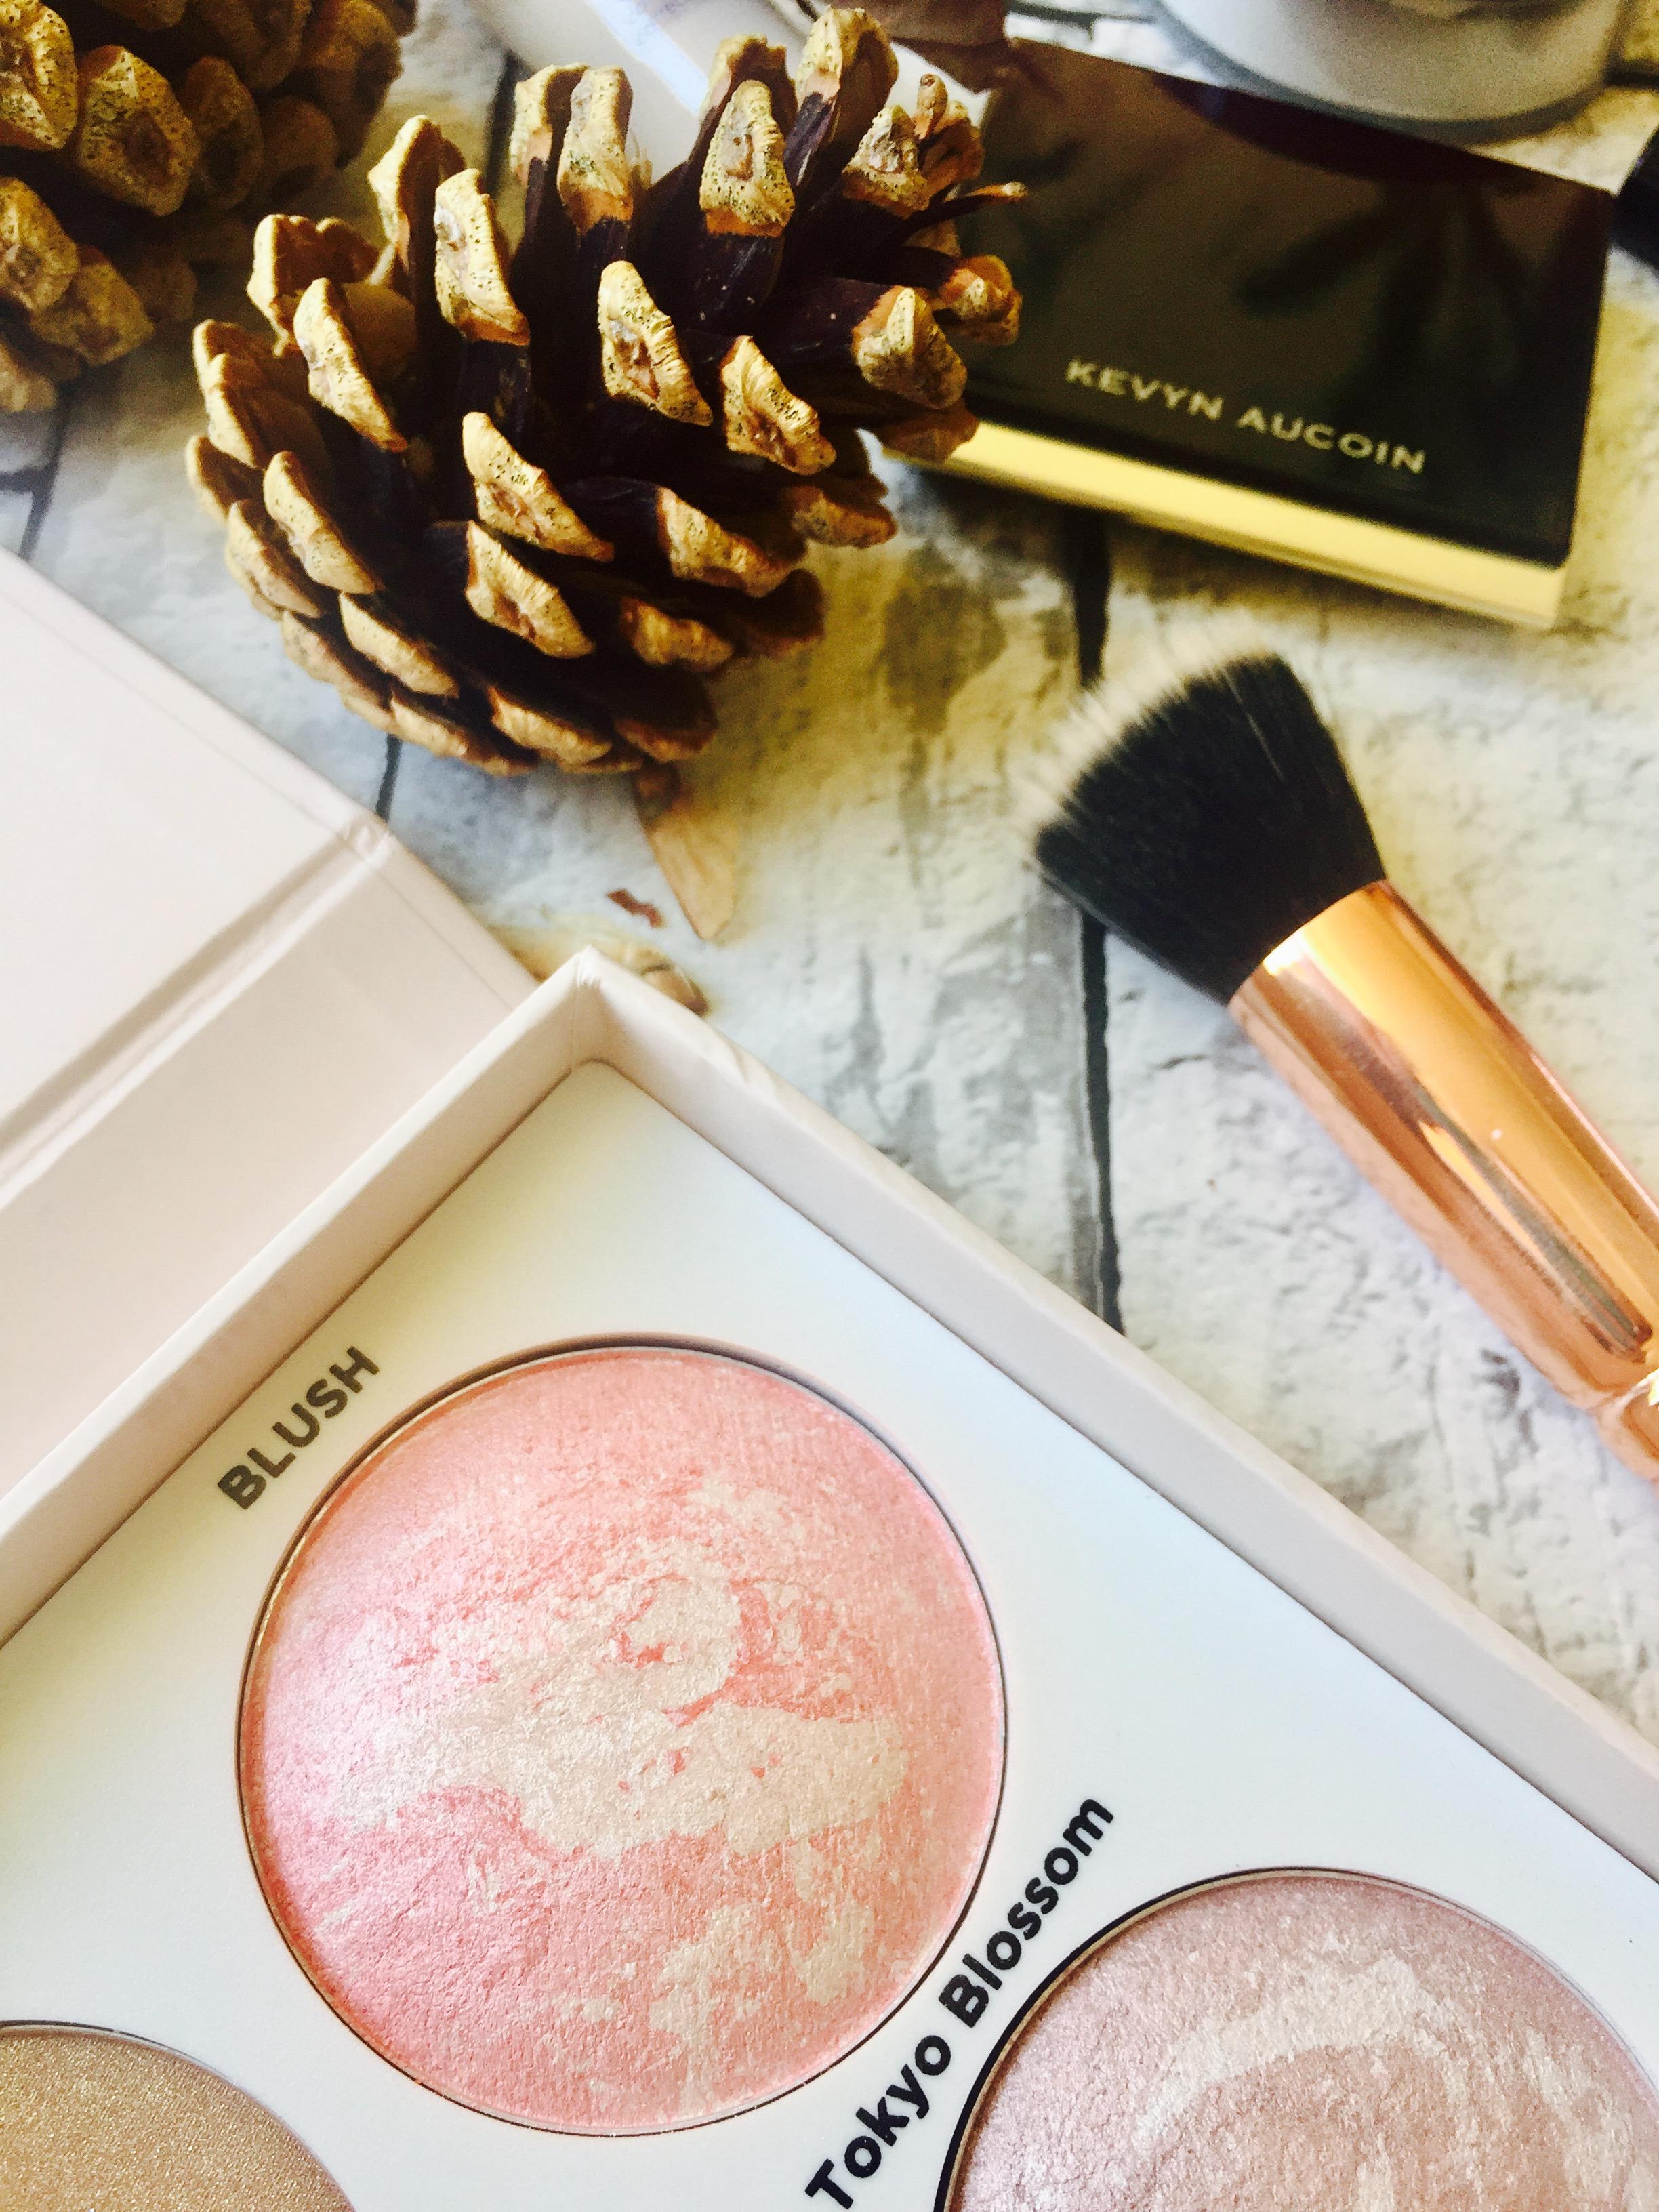 Everyday makeup bag essentials autumn edition Urban Decay Charlotte Tilbury Mac ahb cosmetics benefit The Ordinary